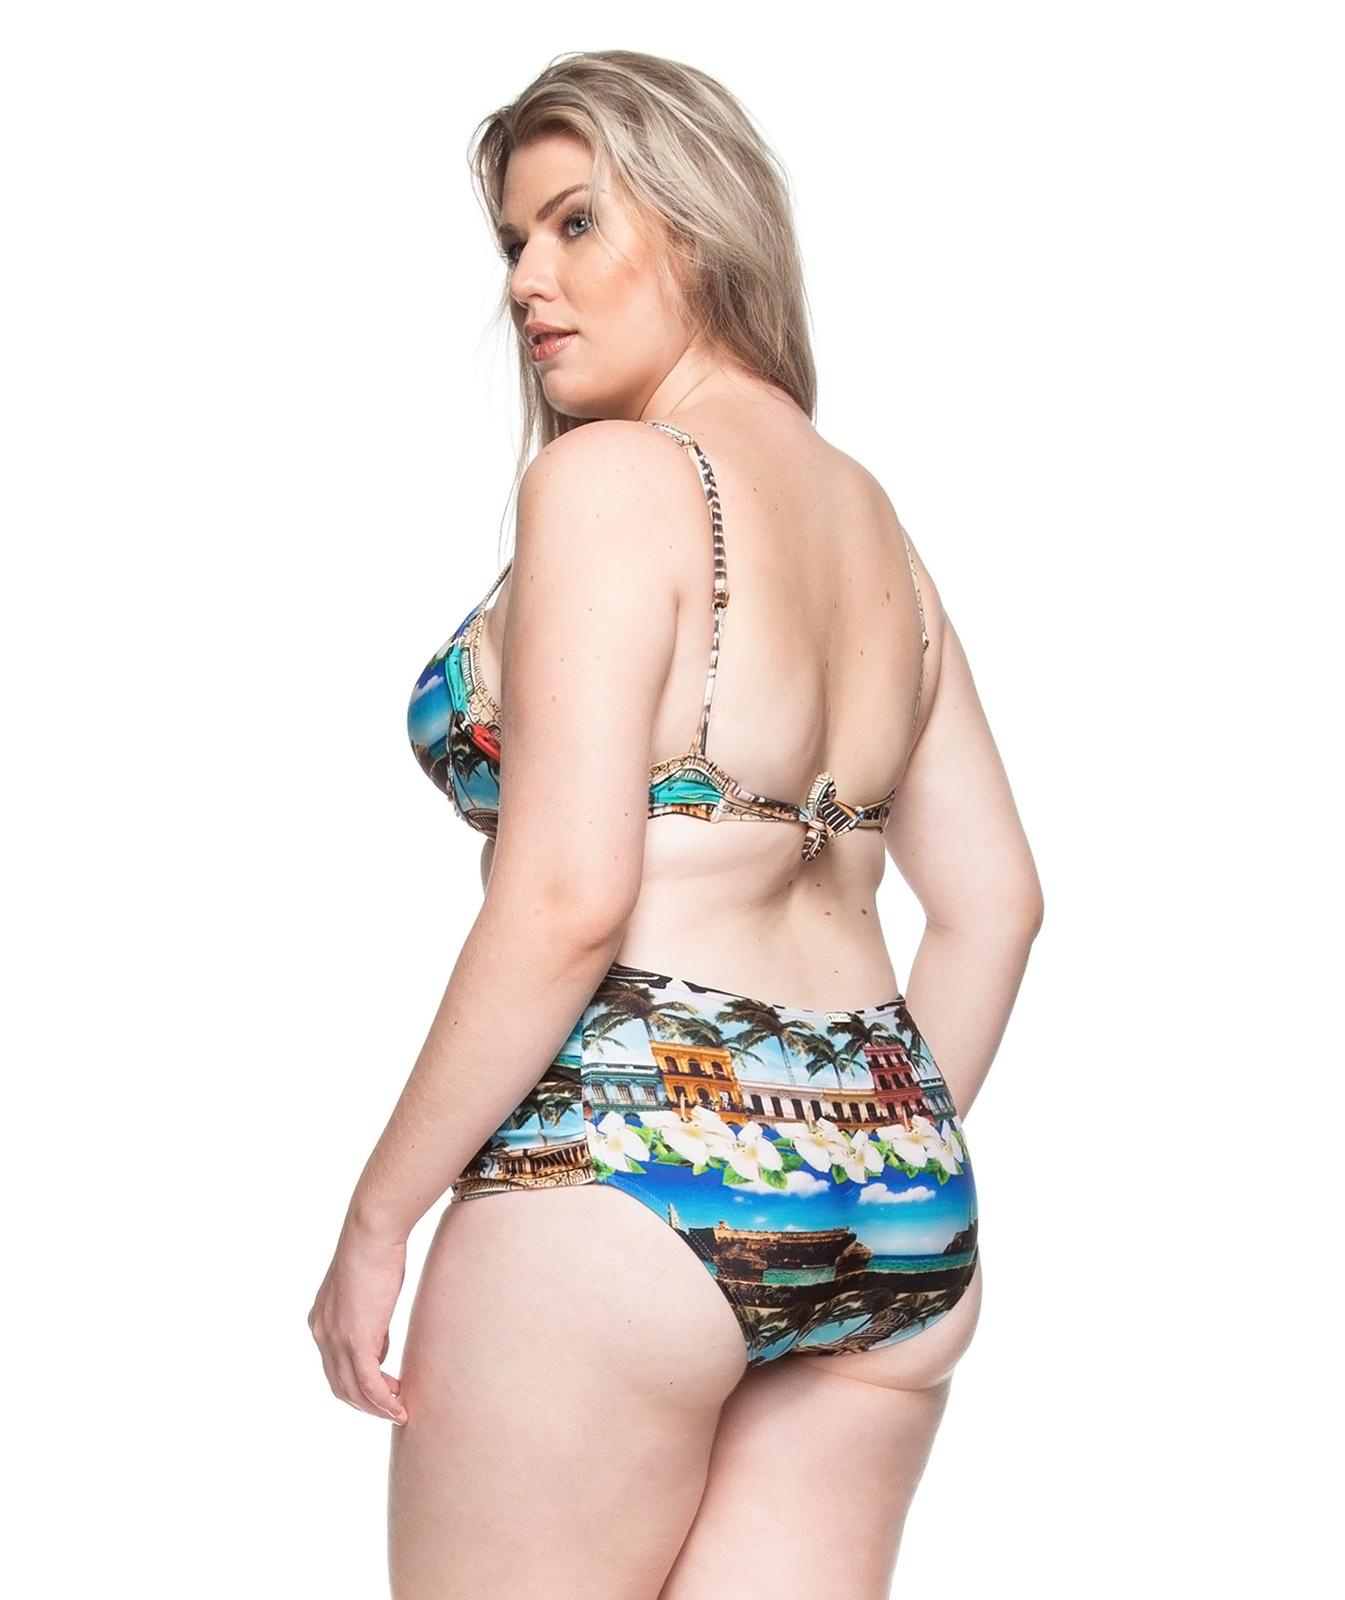 eff3ab598b ... Plus-size balconette bikini with tropical print - PRAIA DE PILAR